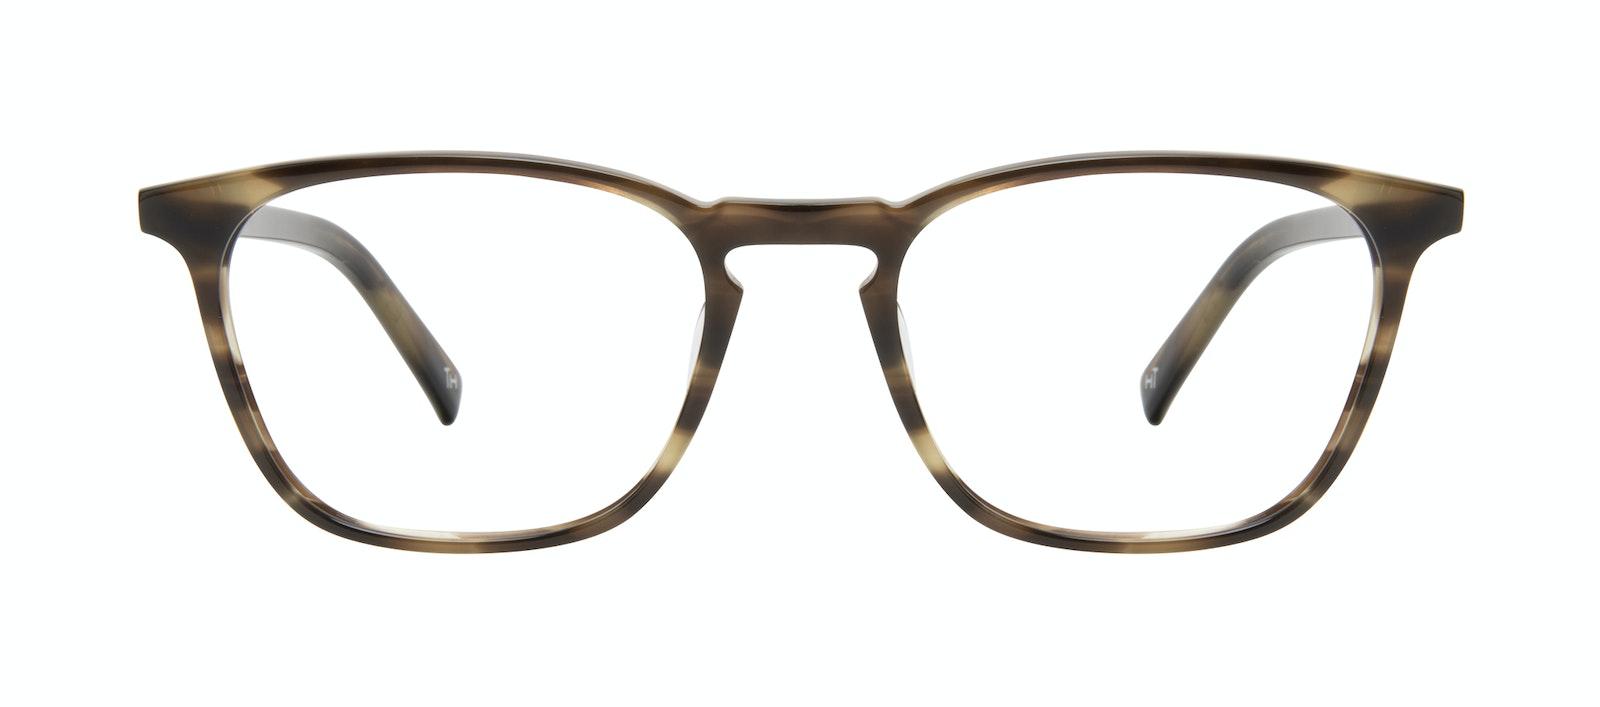 Affordable Fashion Glasses Square Eyeglasses Men Louise Storm Front